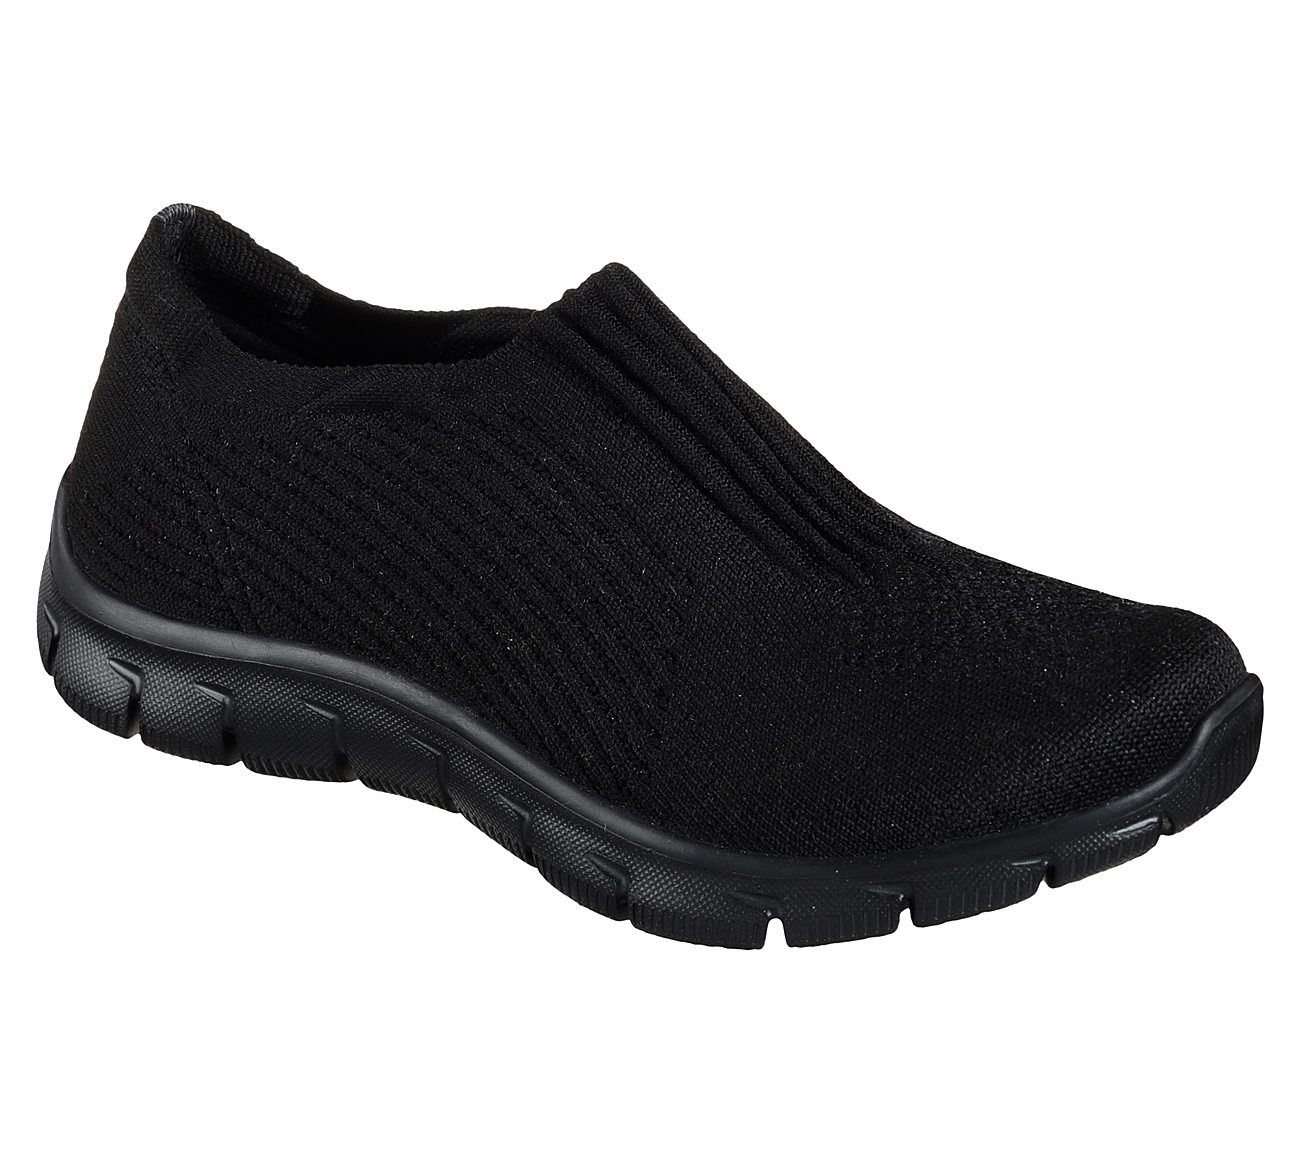 Boys Golf Shoes Size